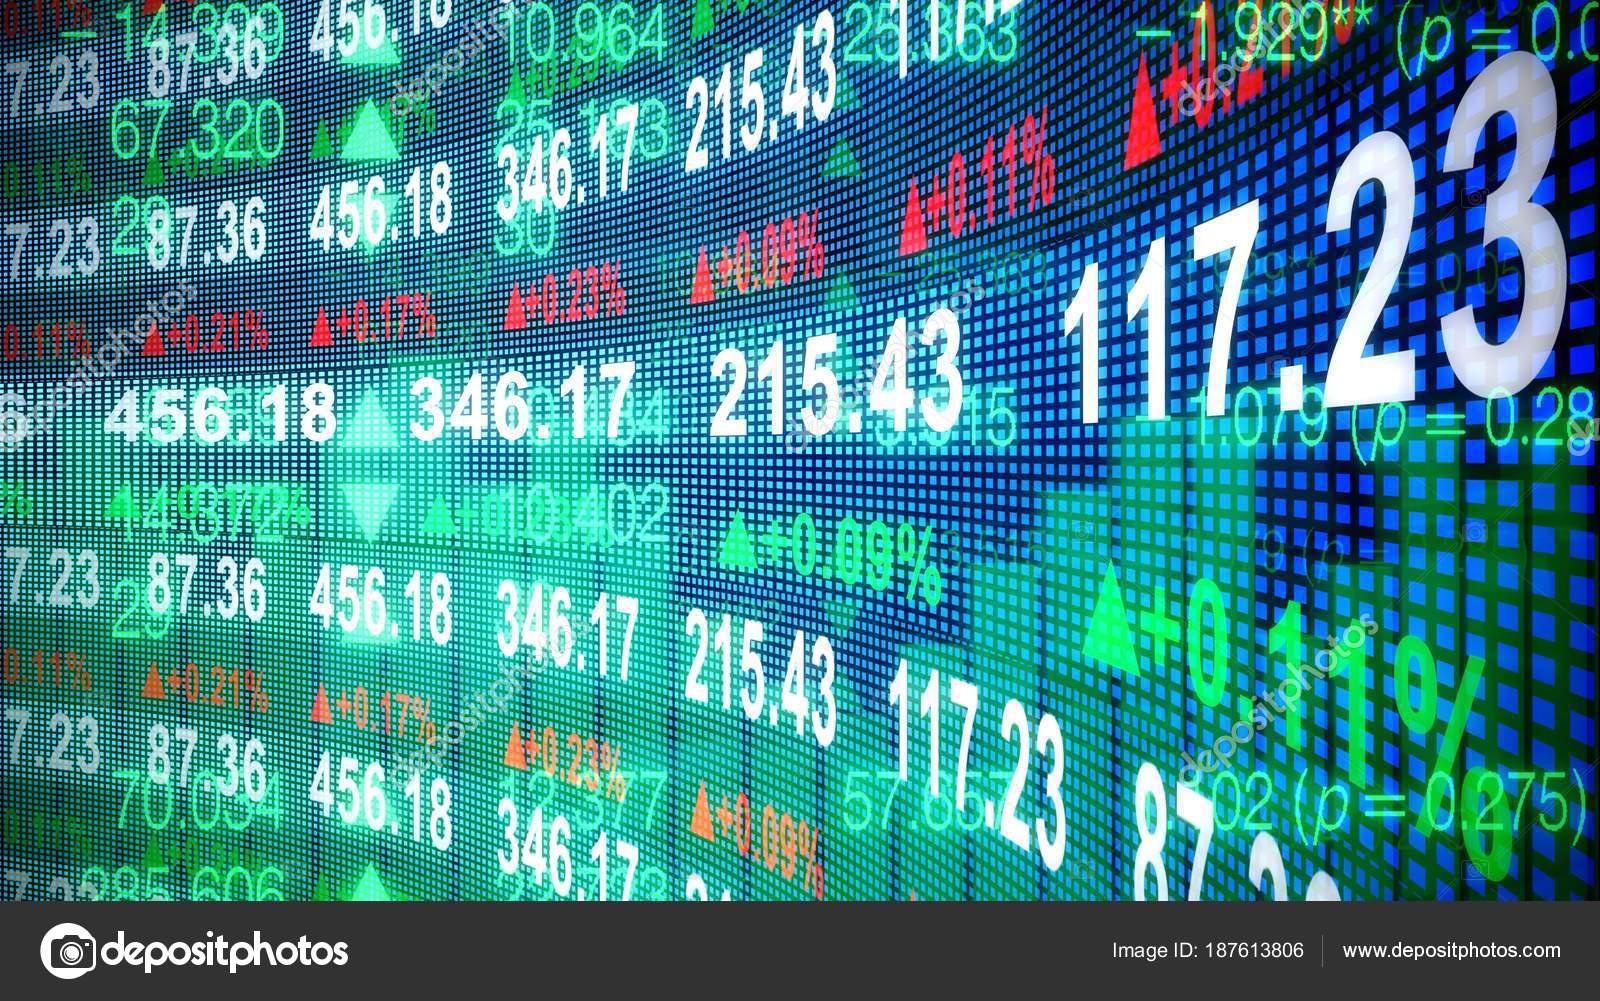 Бизнес идея рынок форекс валюты доллар